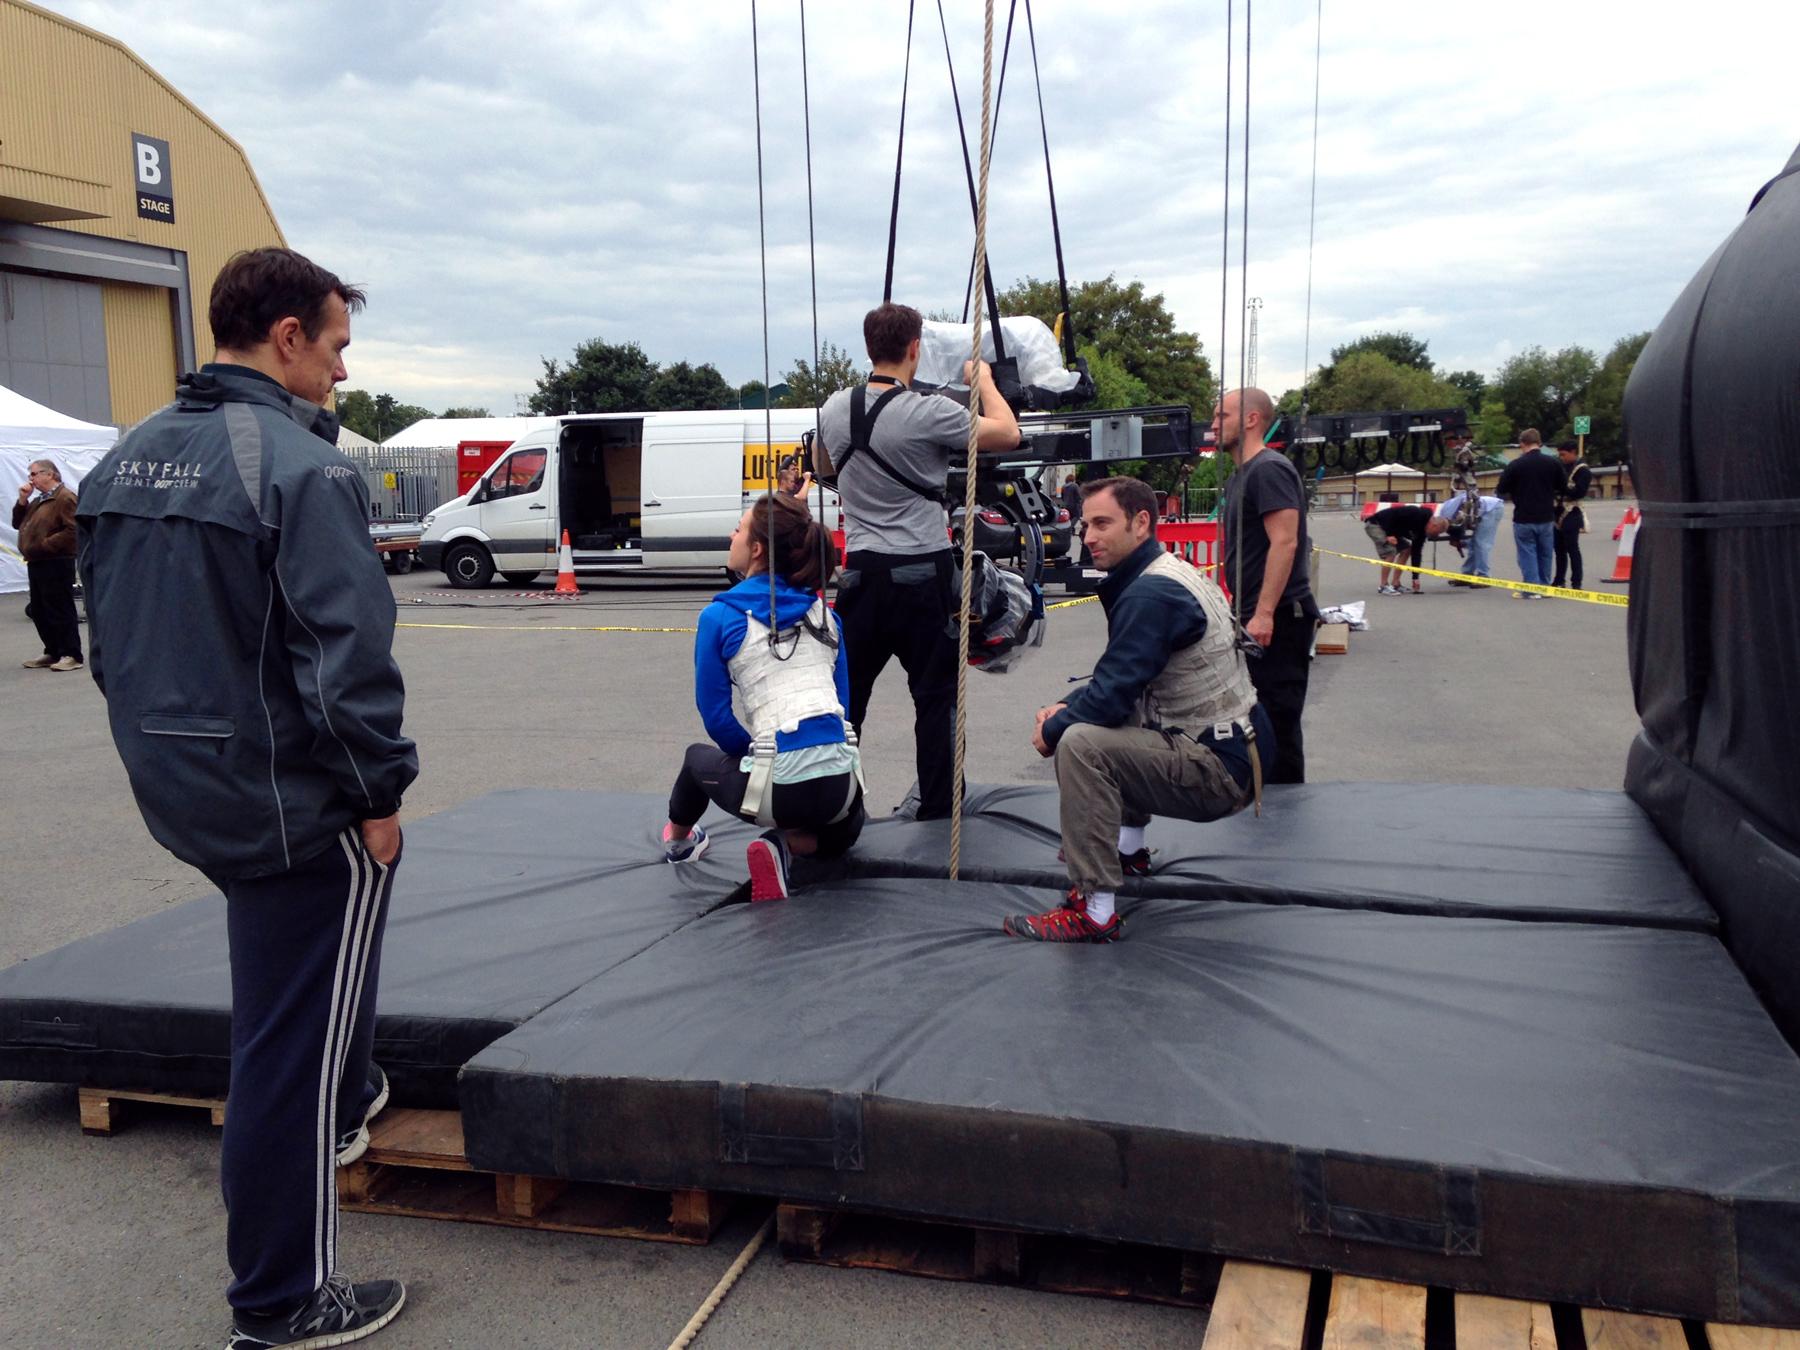 MG-Action, Martin Goeres, Stunt, Rigging, Utility Stunt, London